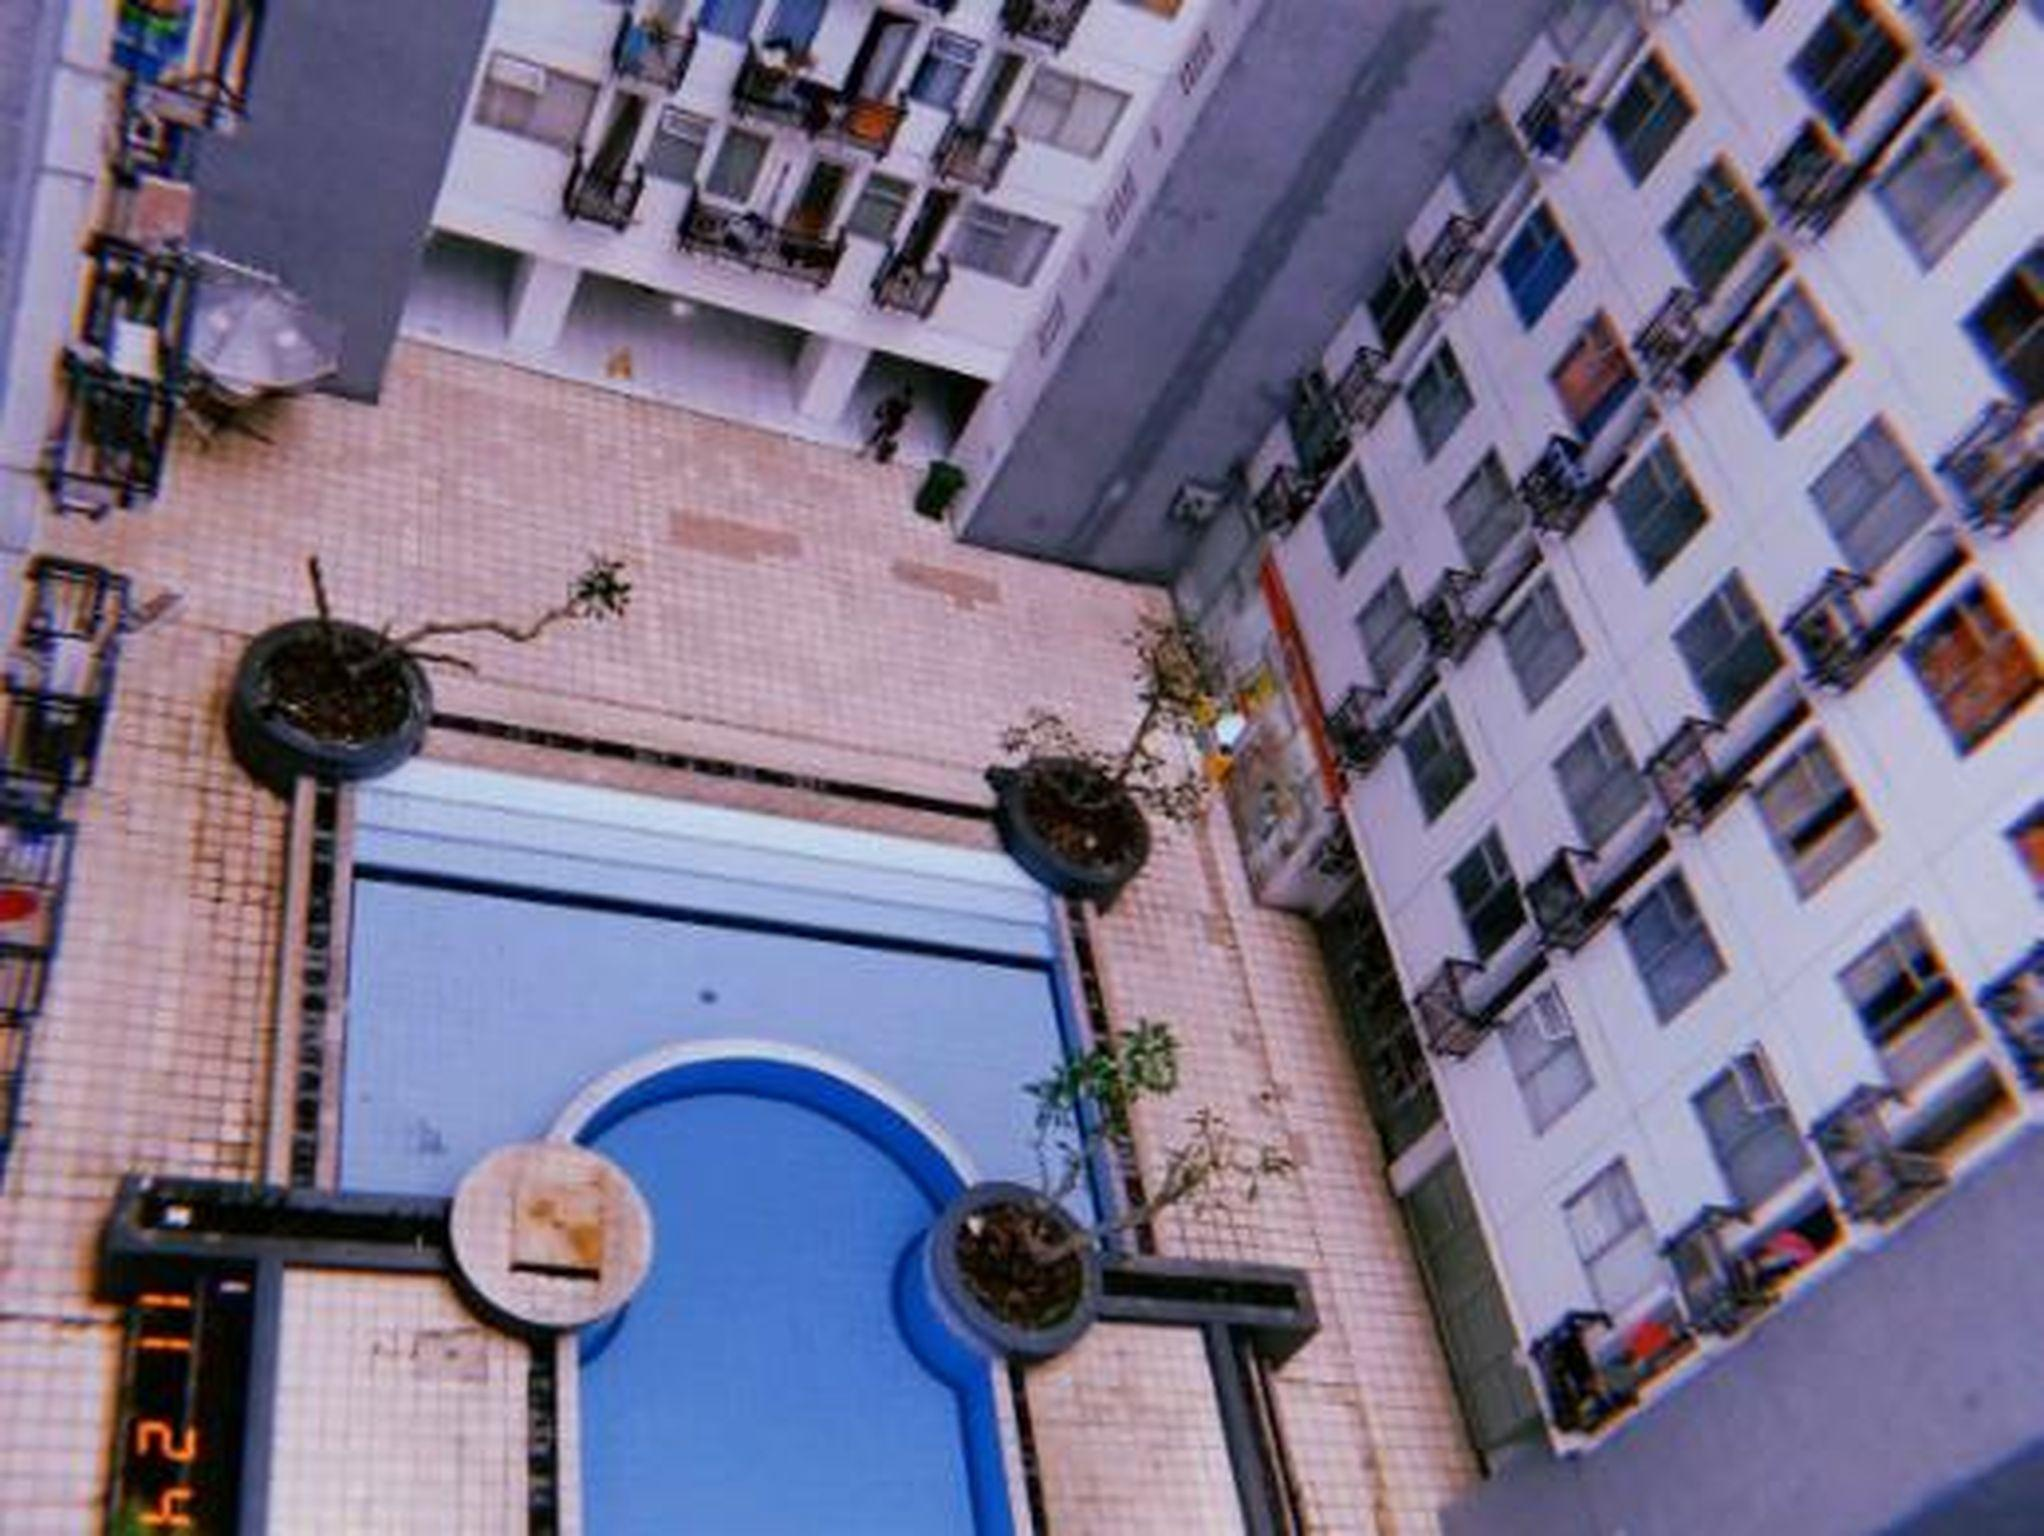 2BR Unit 10 At Jarrdin Apartment   R2 Residence